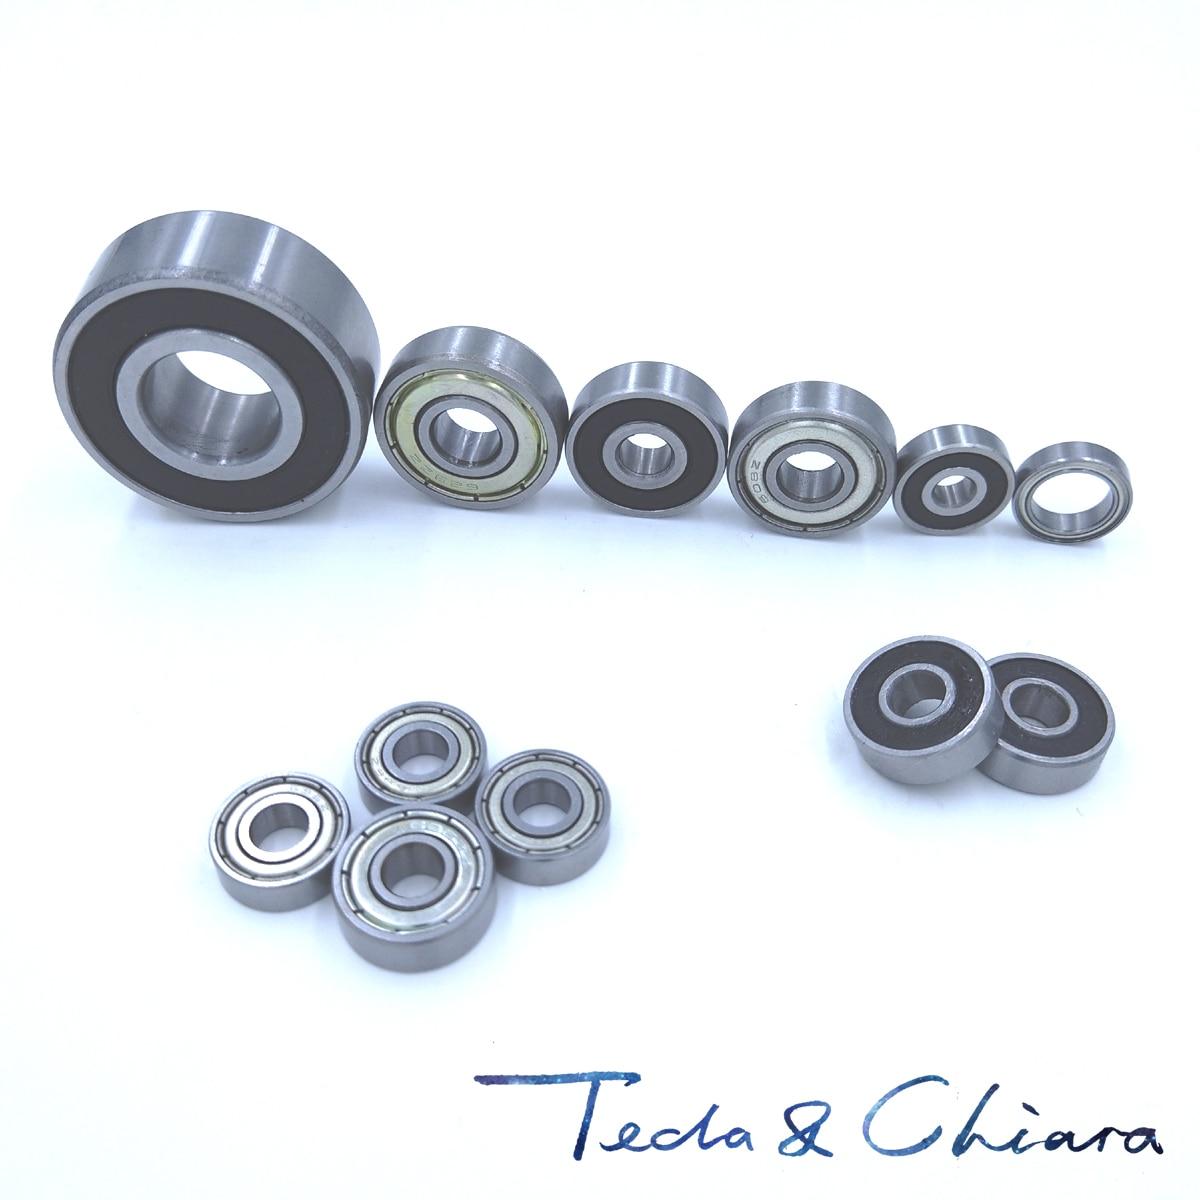 5x11x4 mm Rubber Sealed Ball Bearing Bearings BLACK MR115RS 100PCS MR115-2RS